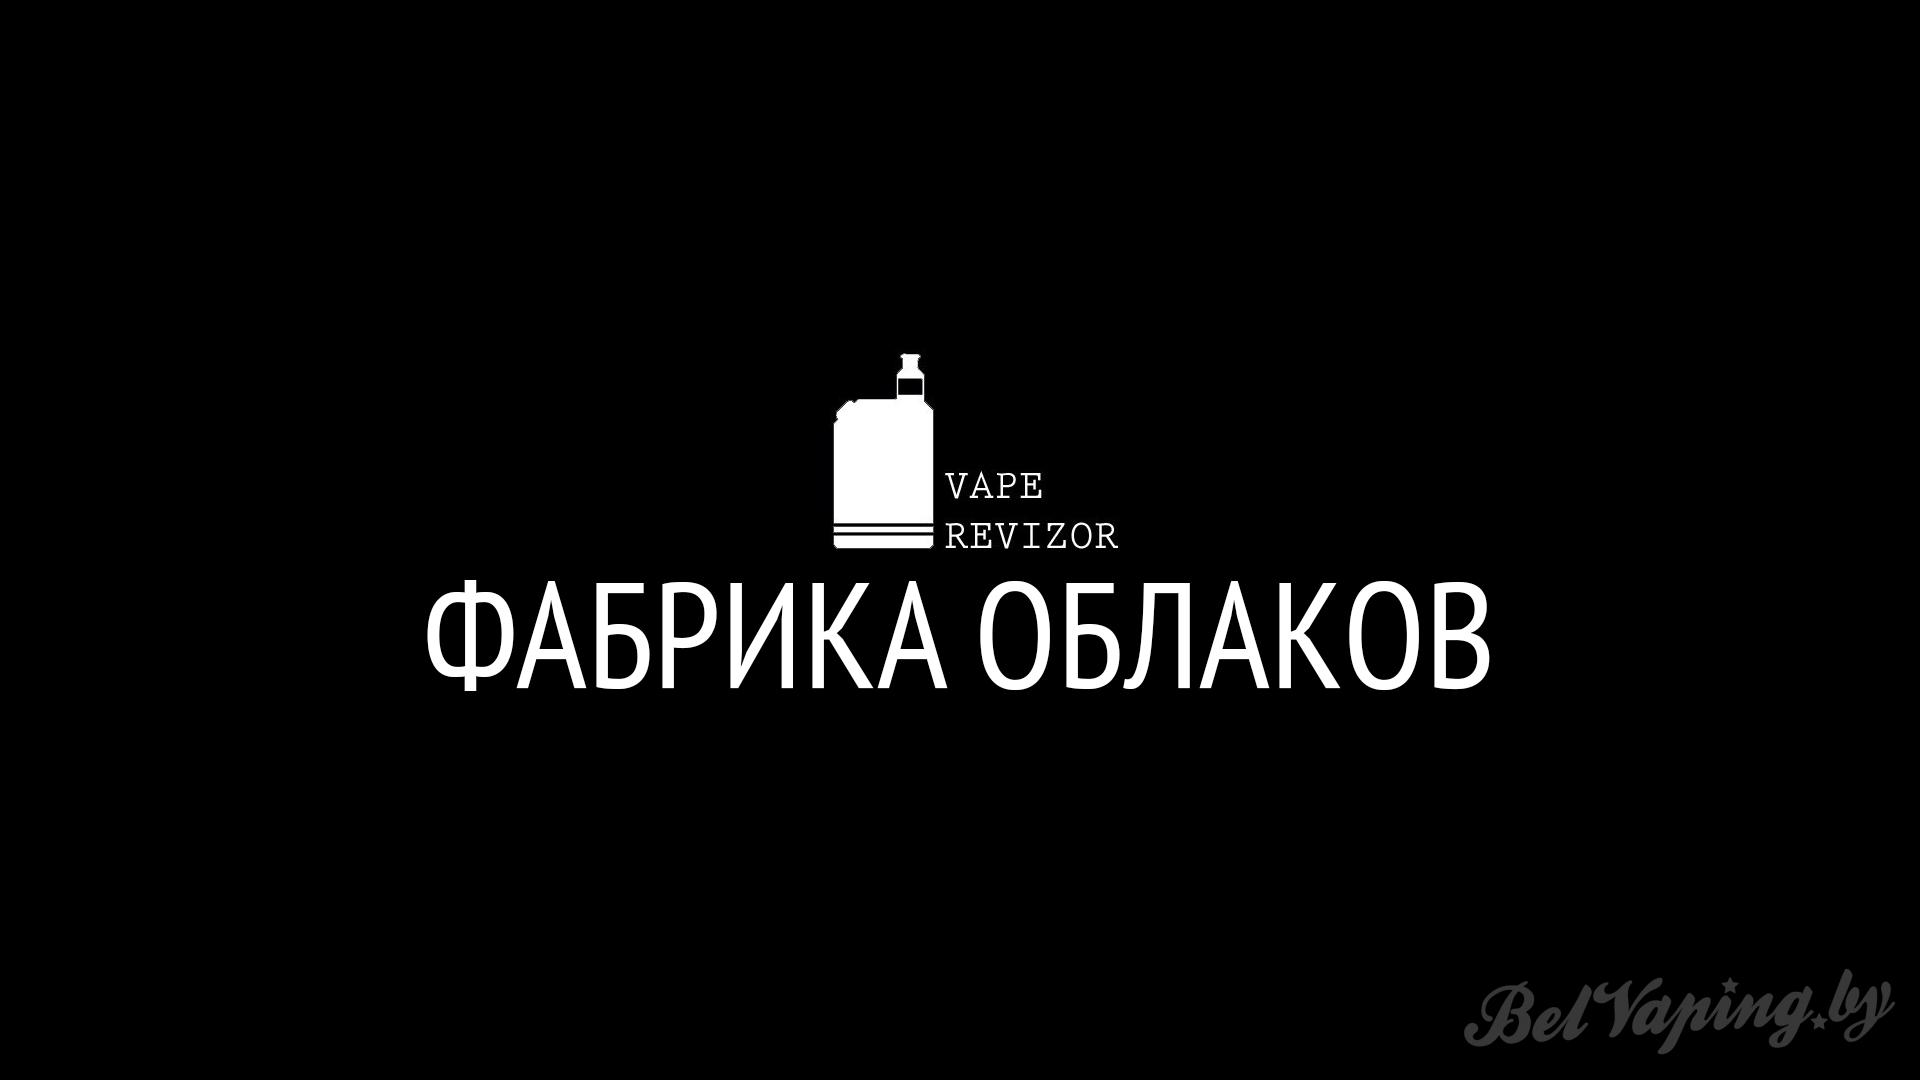 Vape Revizor: Фабрика Облаков